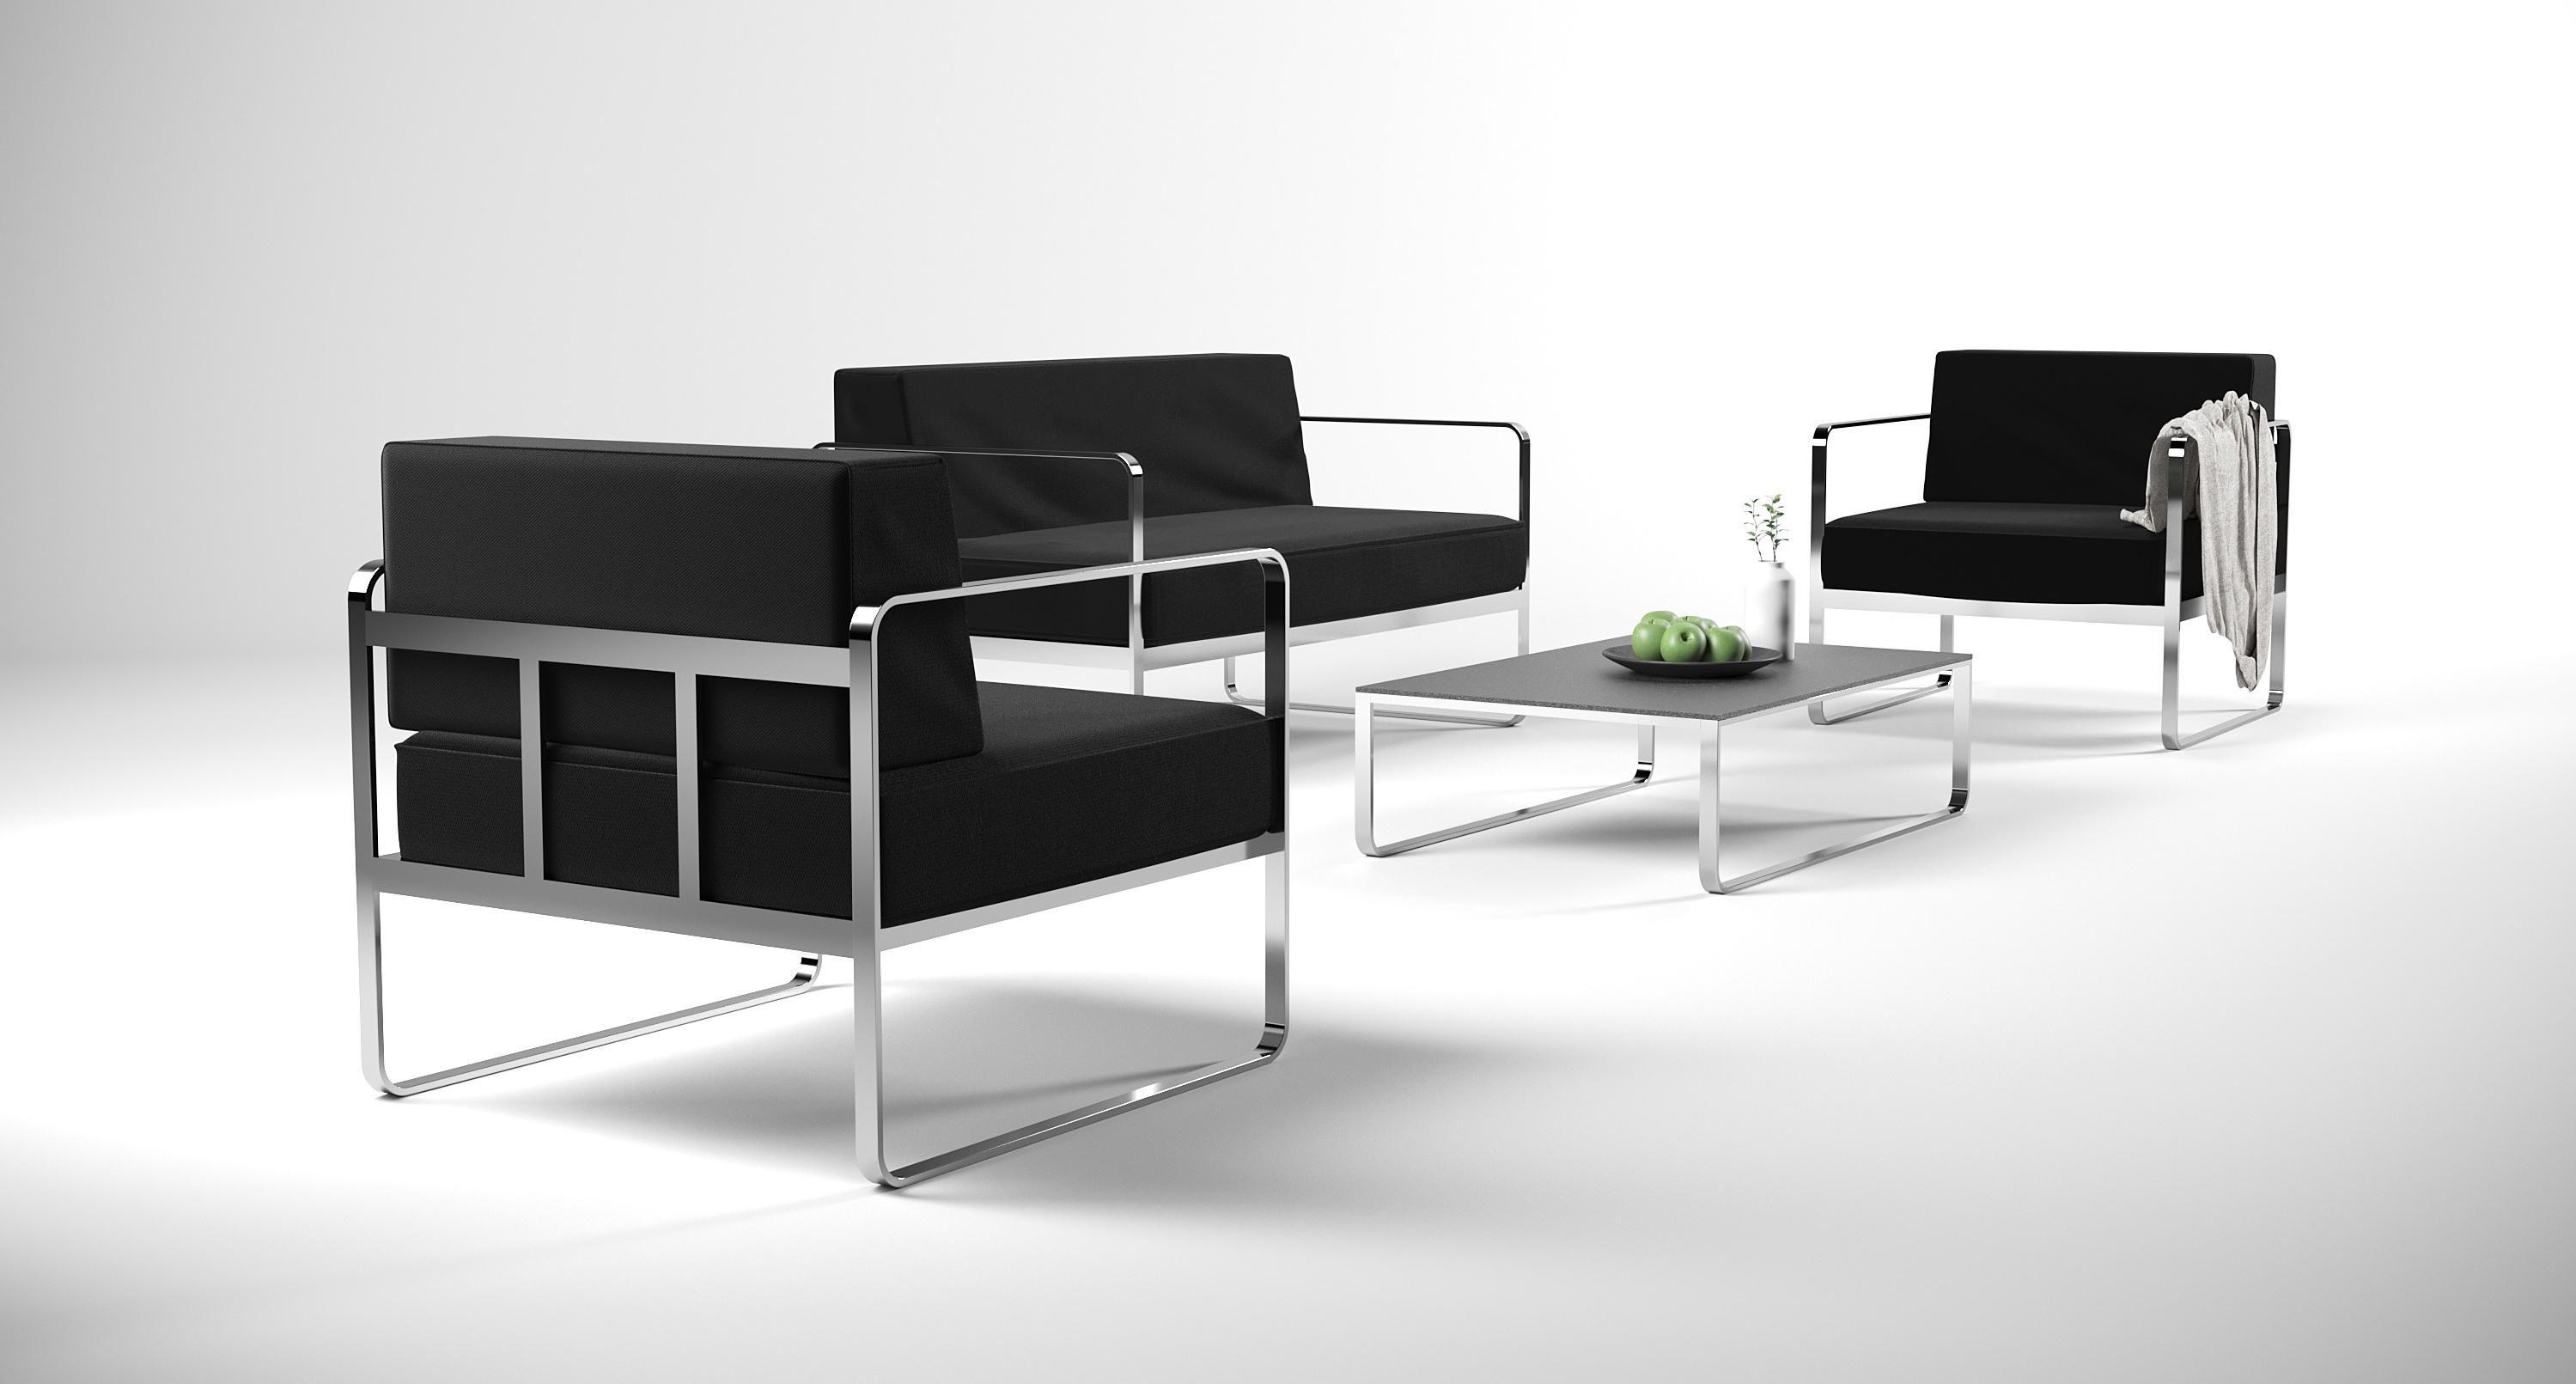 edelstahl sofa set valencia schwarz gartenmoebel fuer lounge und balkon living zone. Black Bedroom Furniture Sets. Home Design Ideas